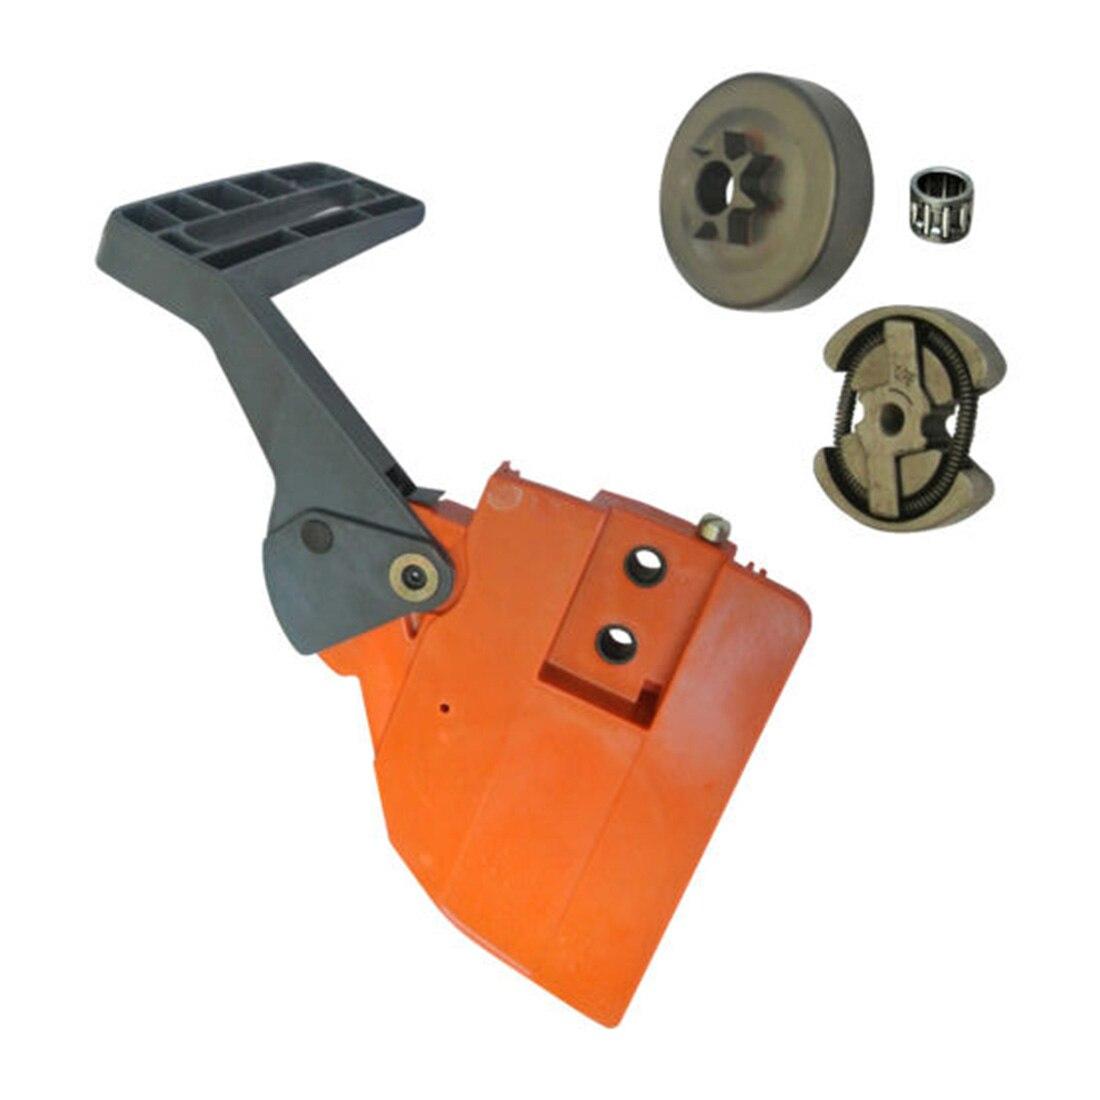 For Husqvarna Clutch Drum Kit 136 137 141 142 Needle Bearing Brake Handle